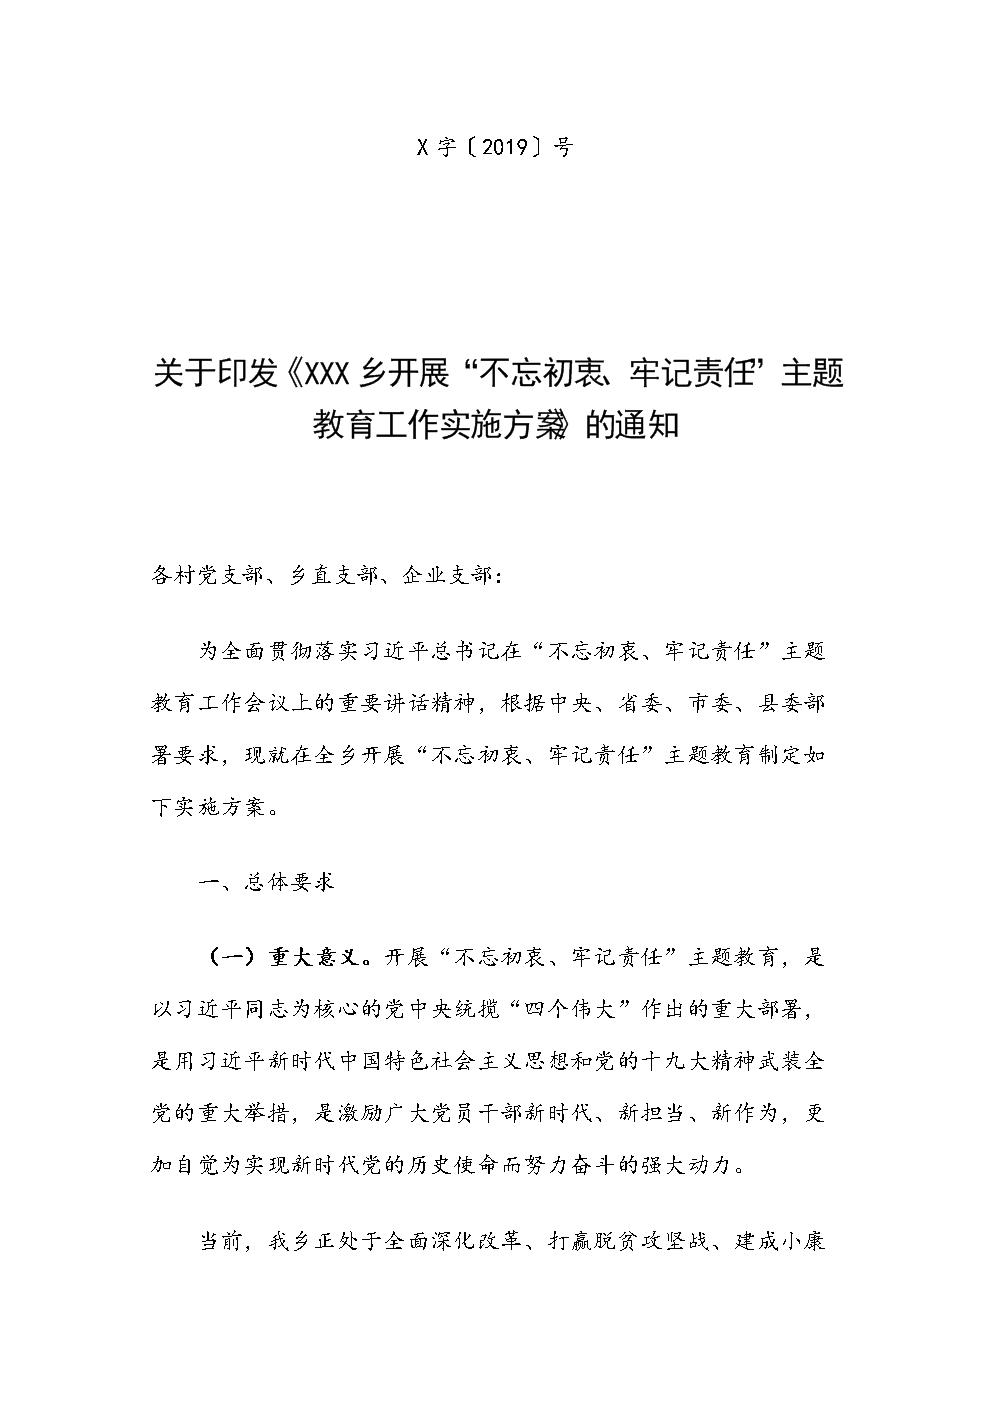 XXX乡开展主题教育工作实施方案.doc